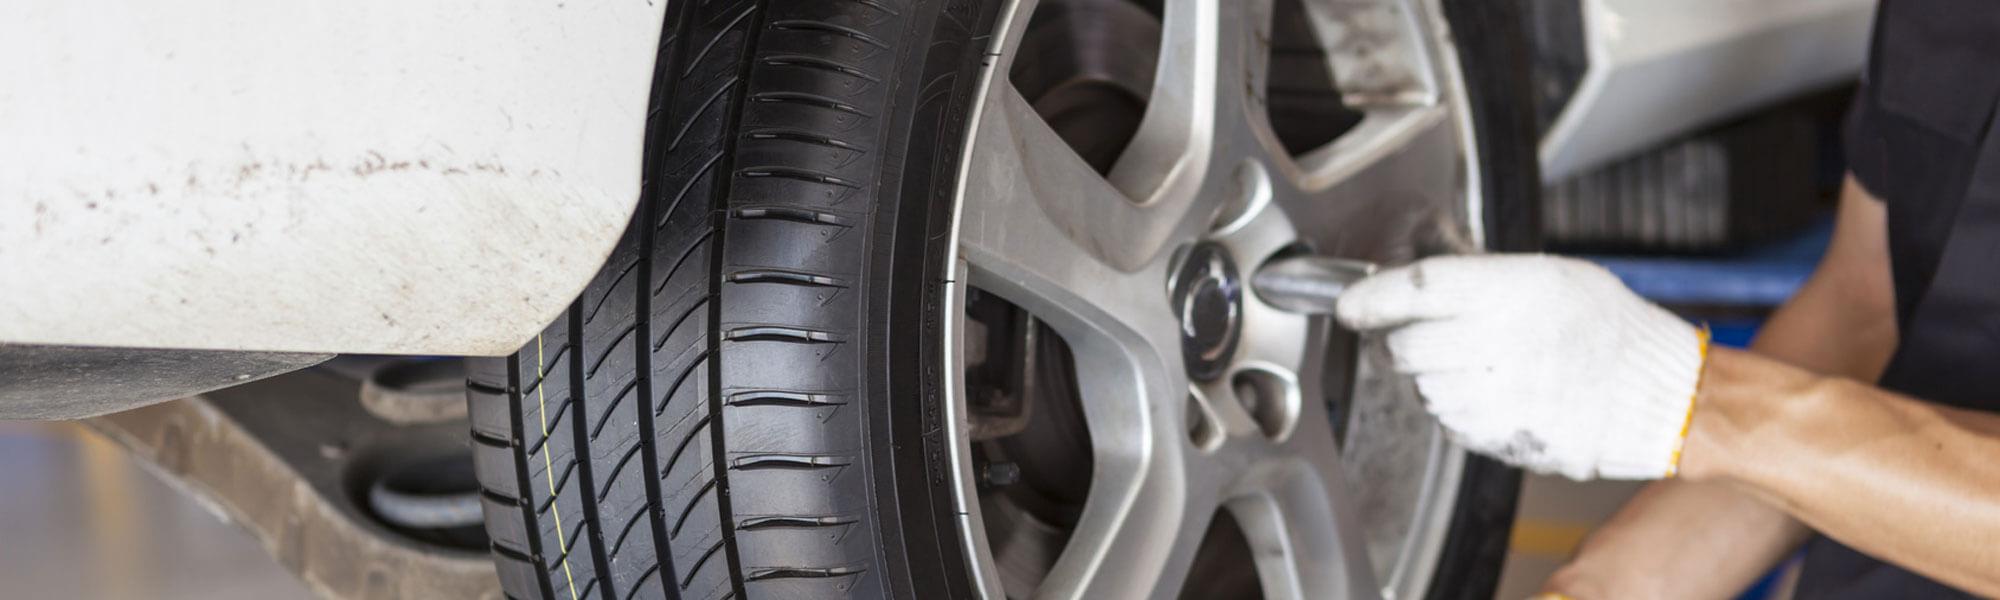 Installing Tire